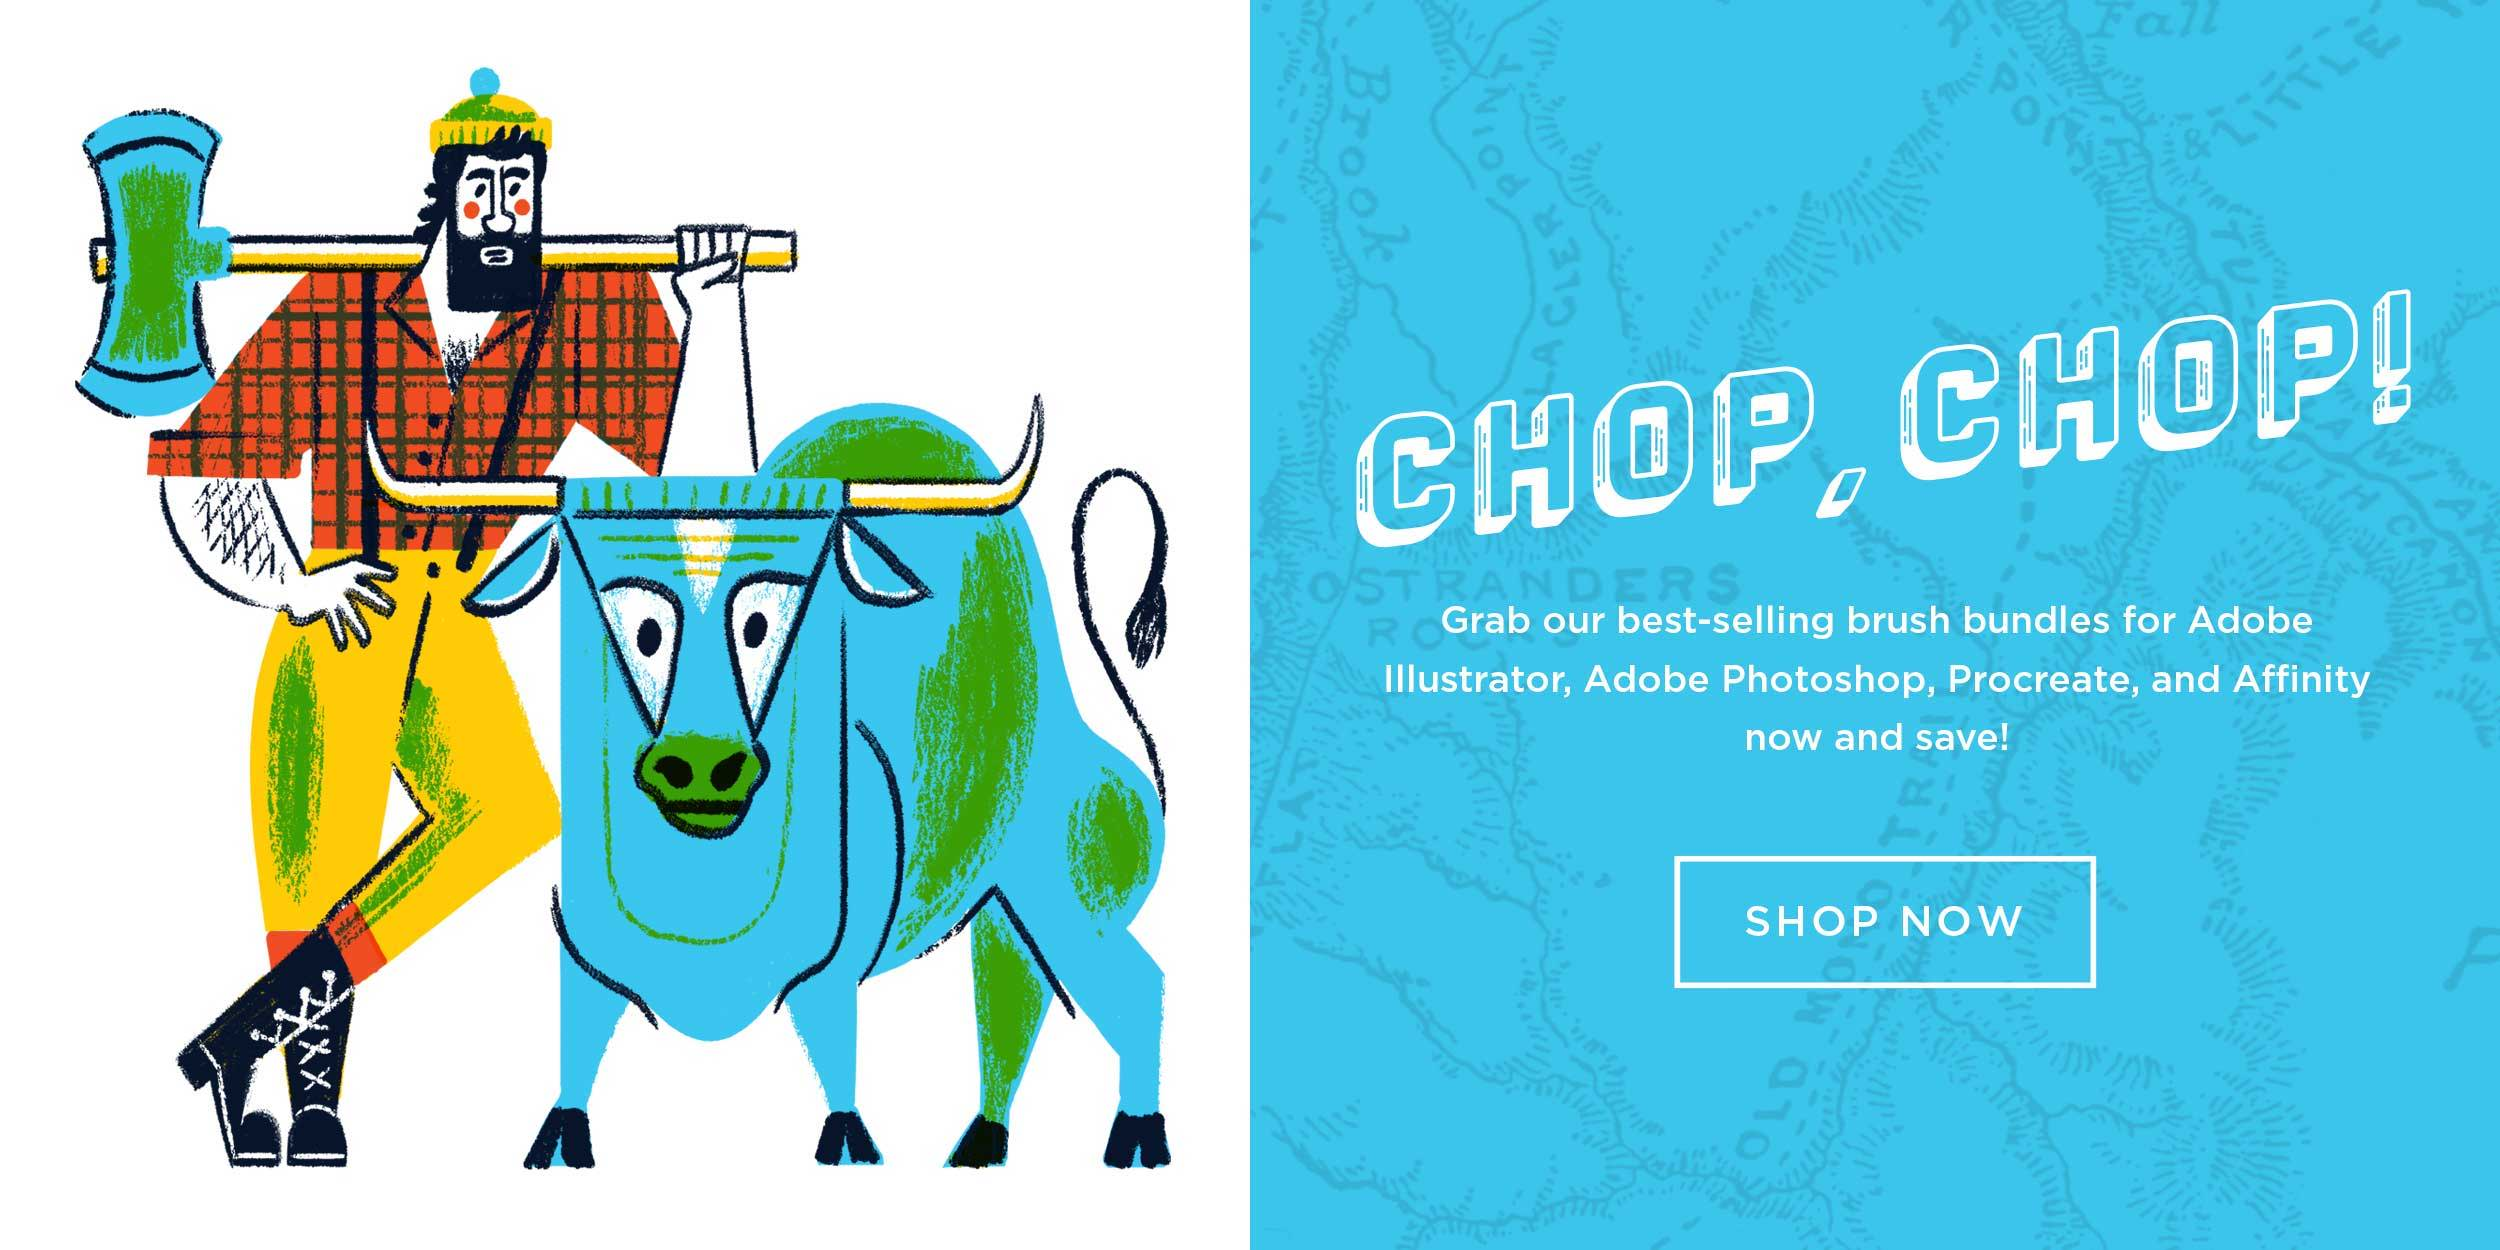 RetroSupply Brushes for Illustrators and Designers